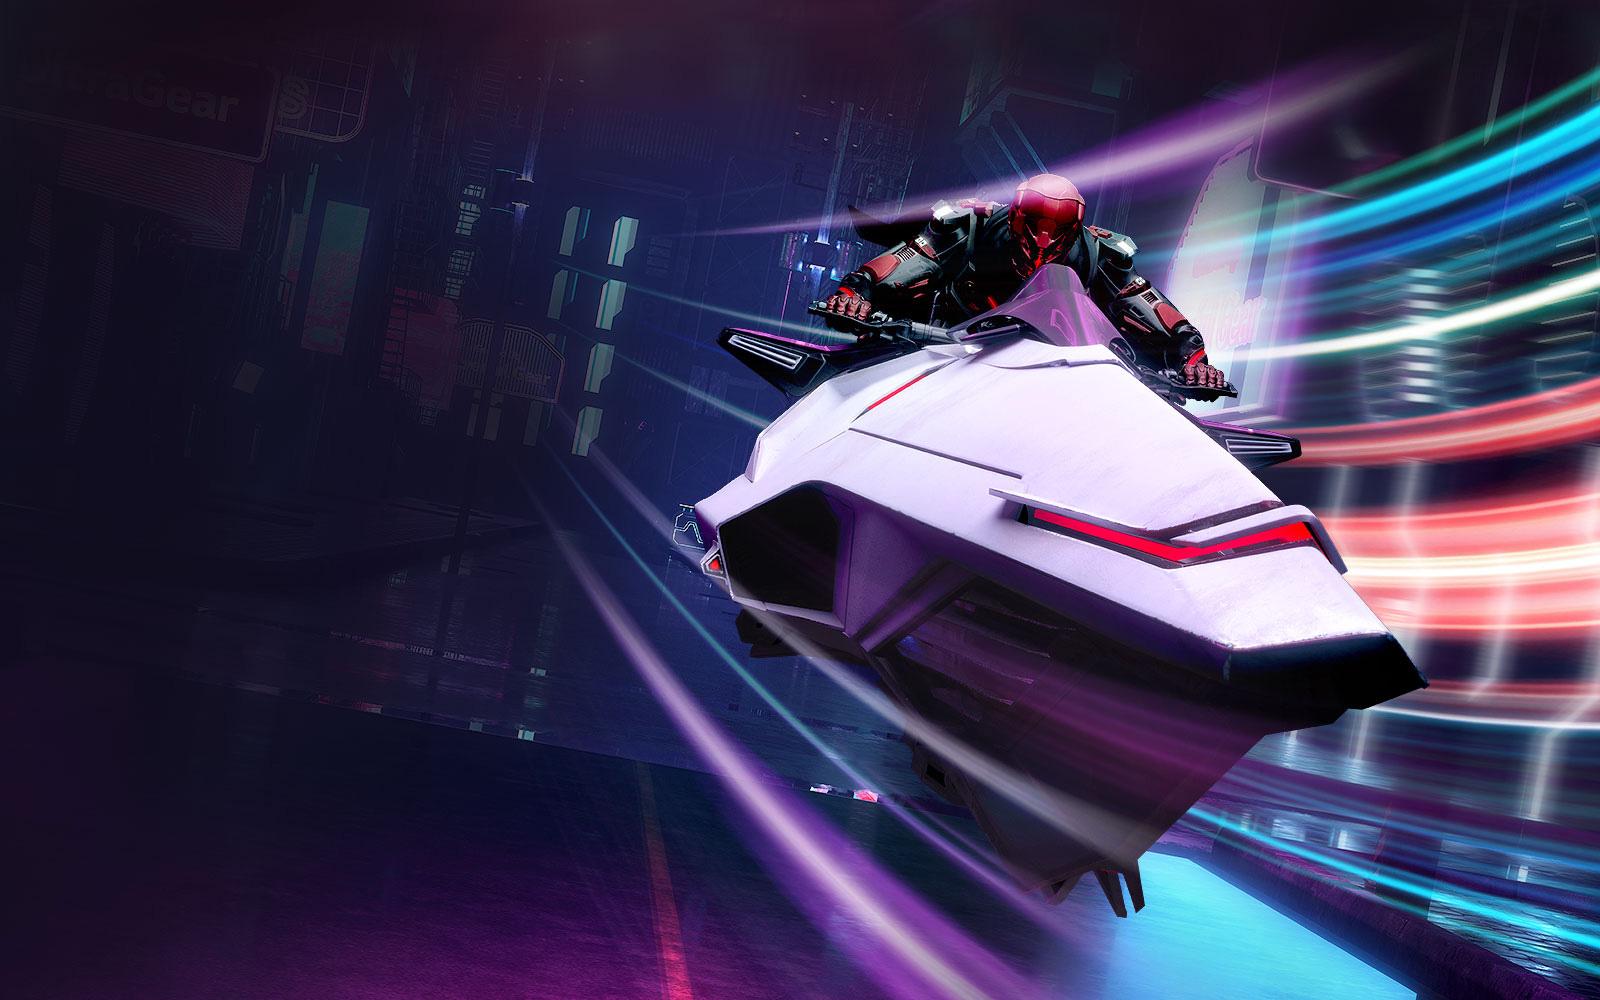 a robot is riding a spaceship